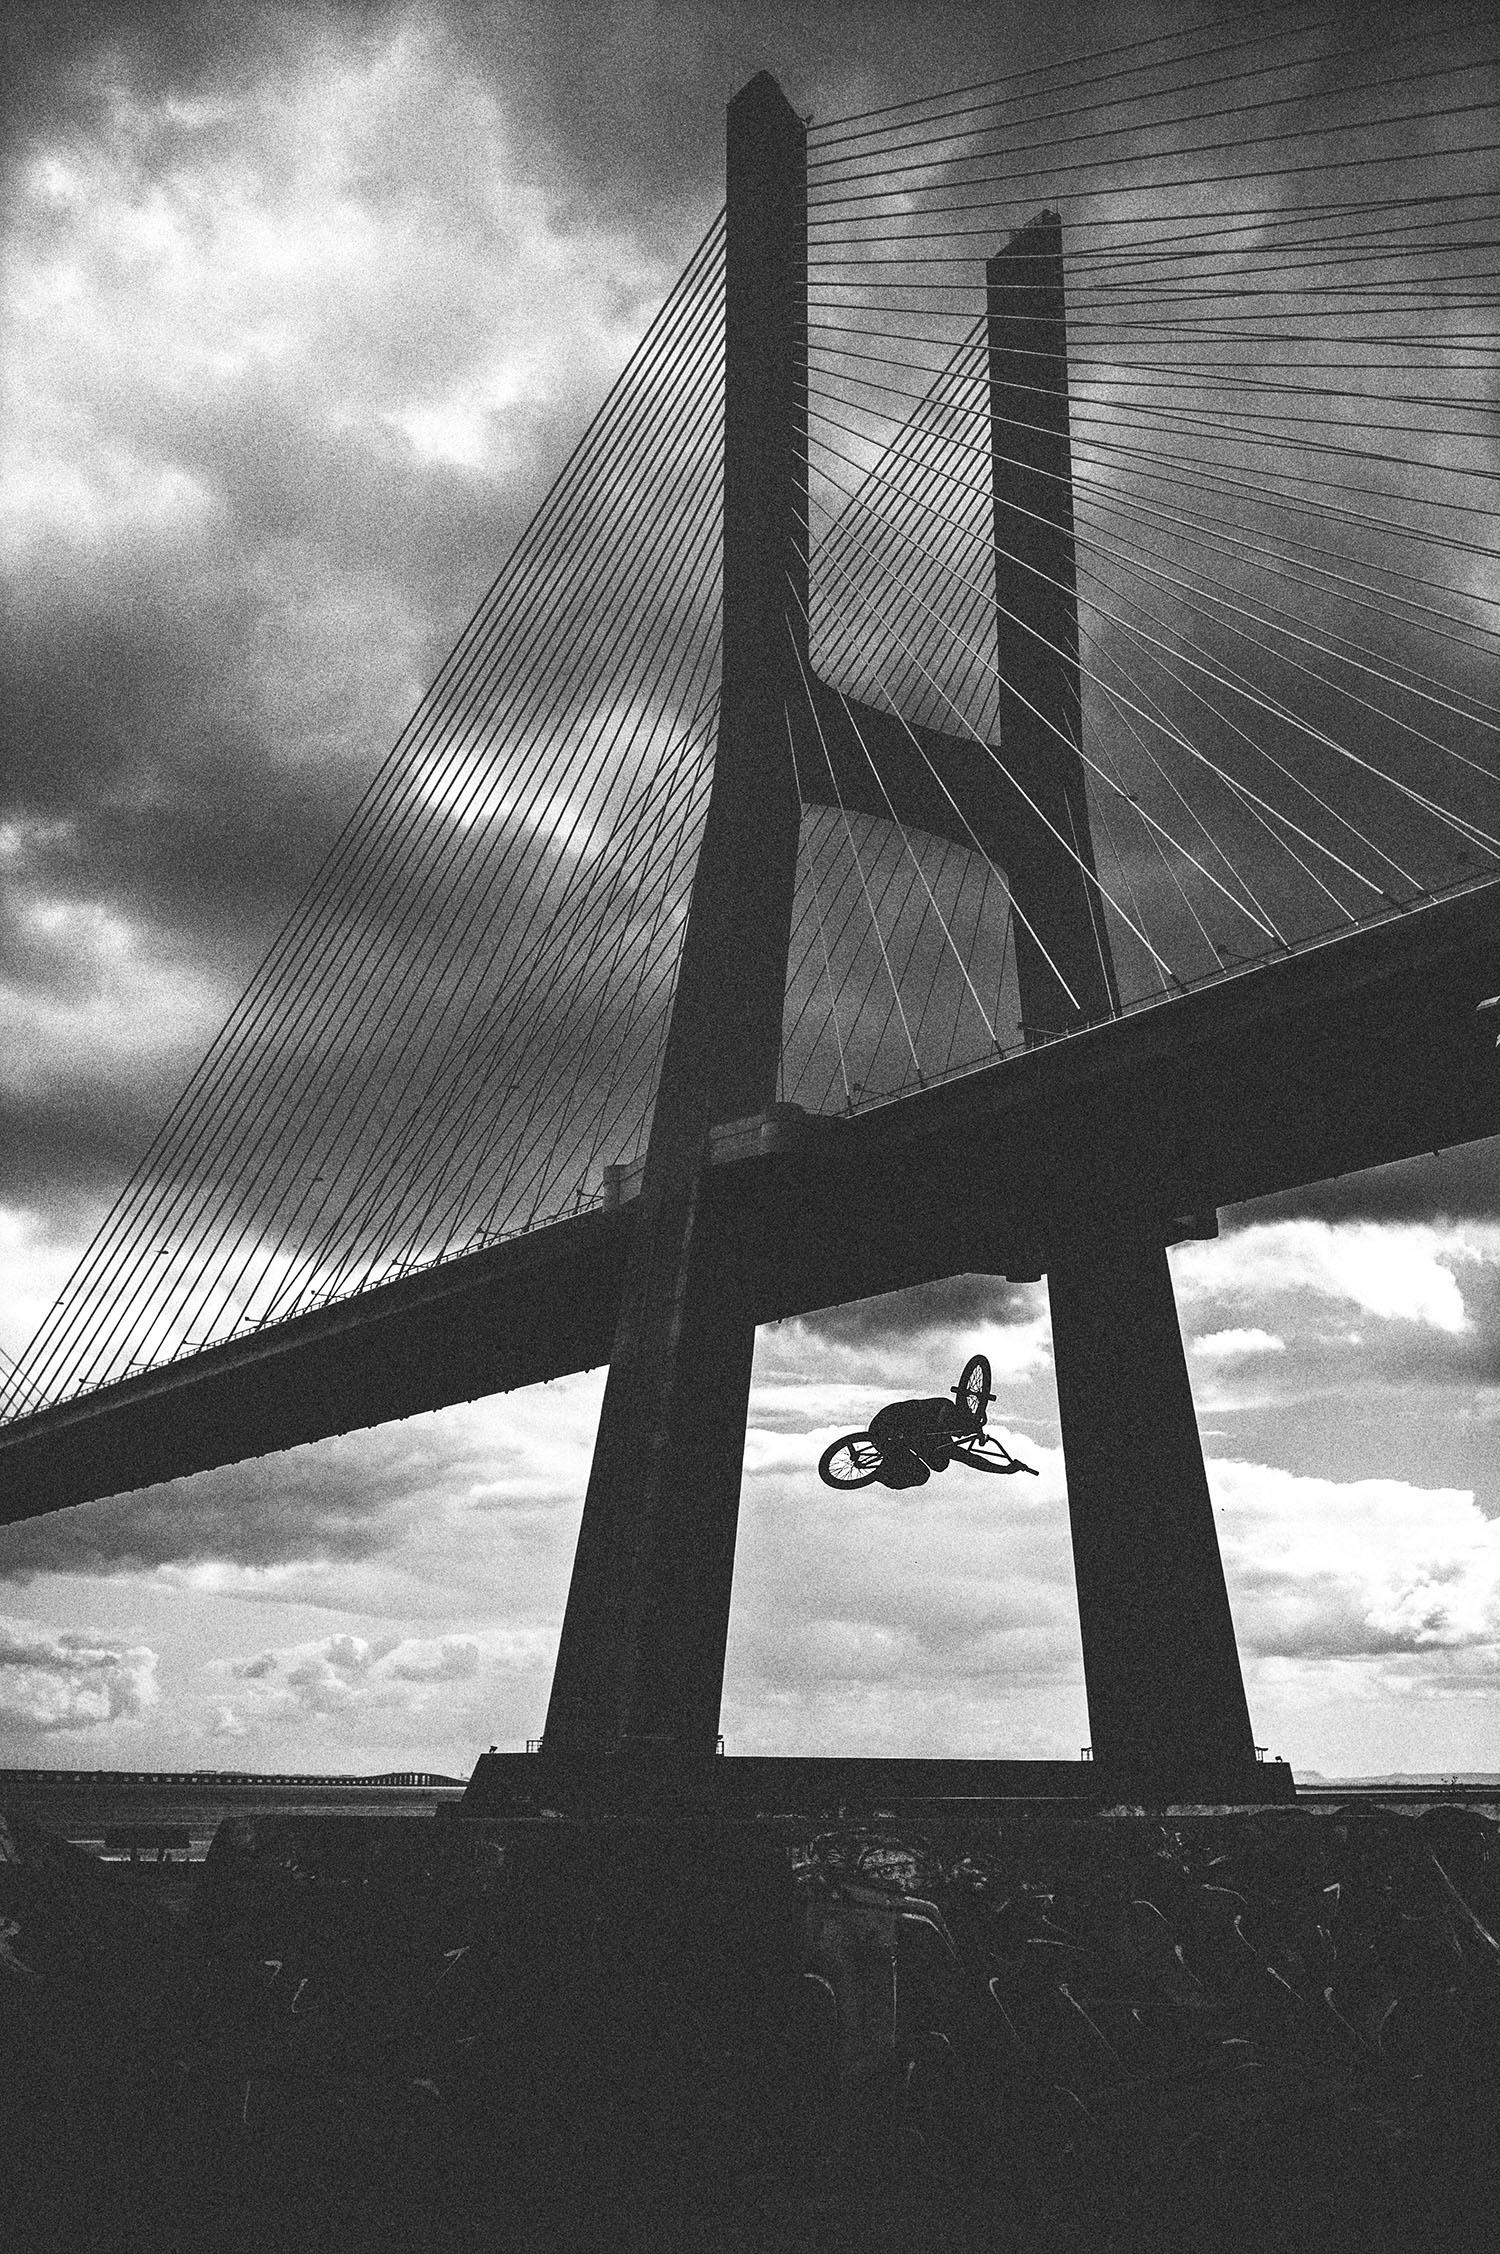 Phil Martin for DIG BMX Magazine - Lisbon, Portugal